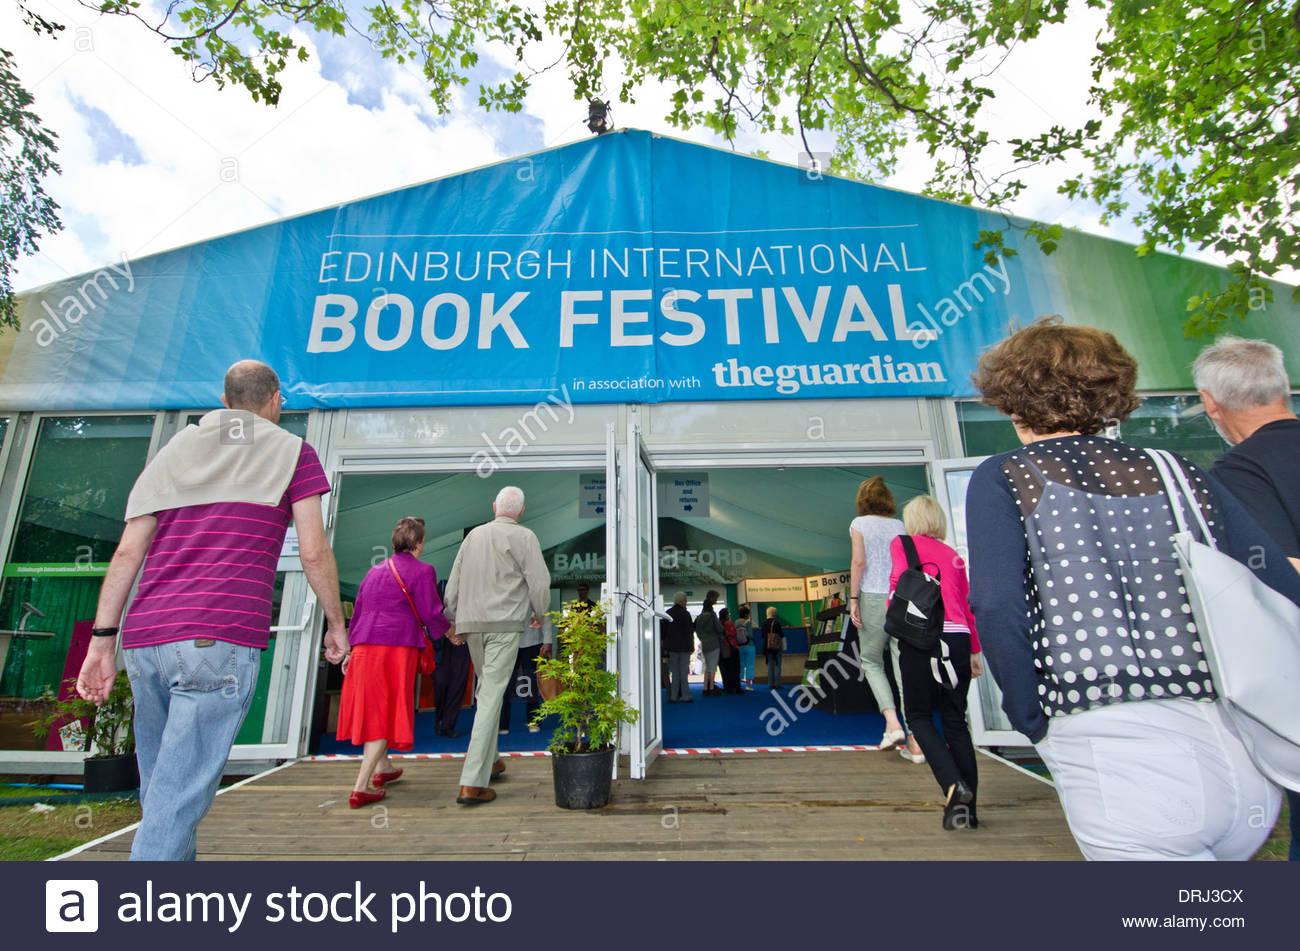 The entrance of the Edinburgh International Book Festival in Charlotte Square Gardens in Edinburgh. - Stock Image